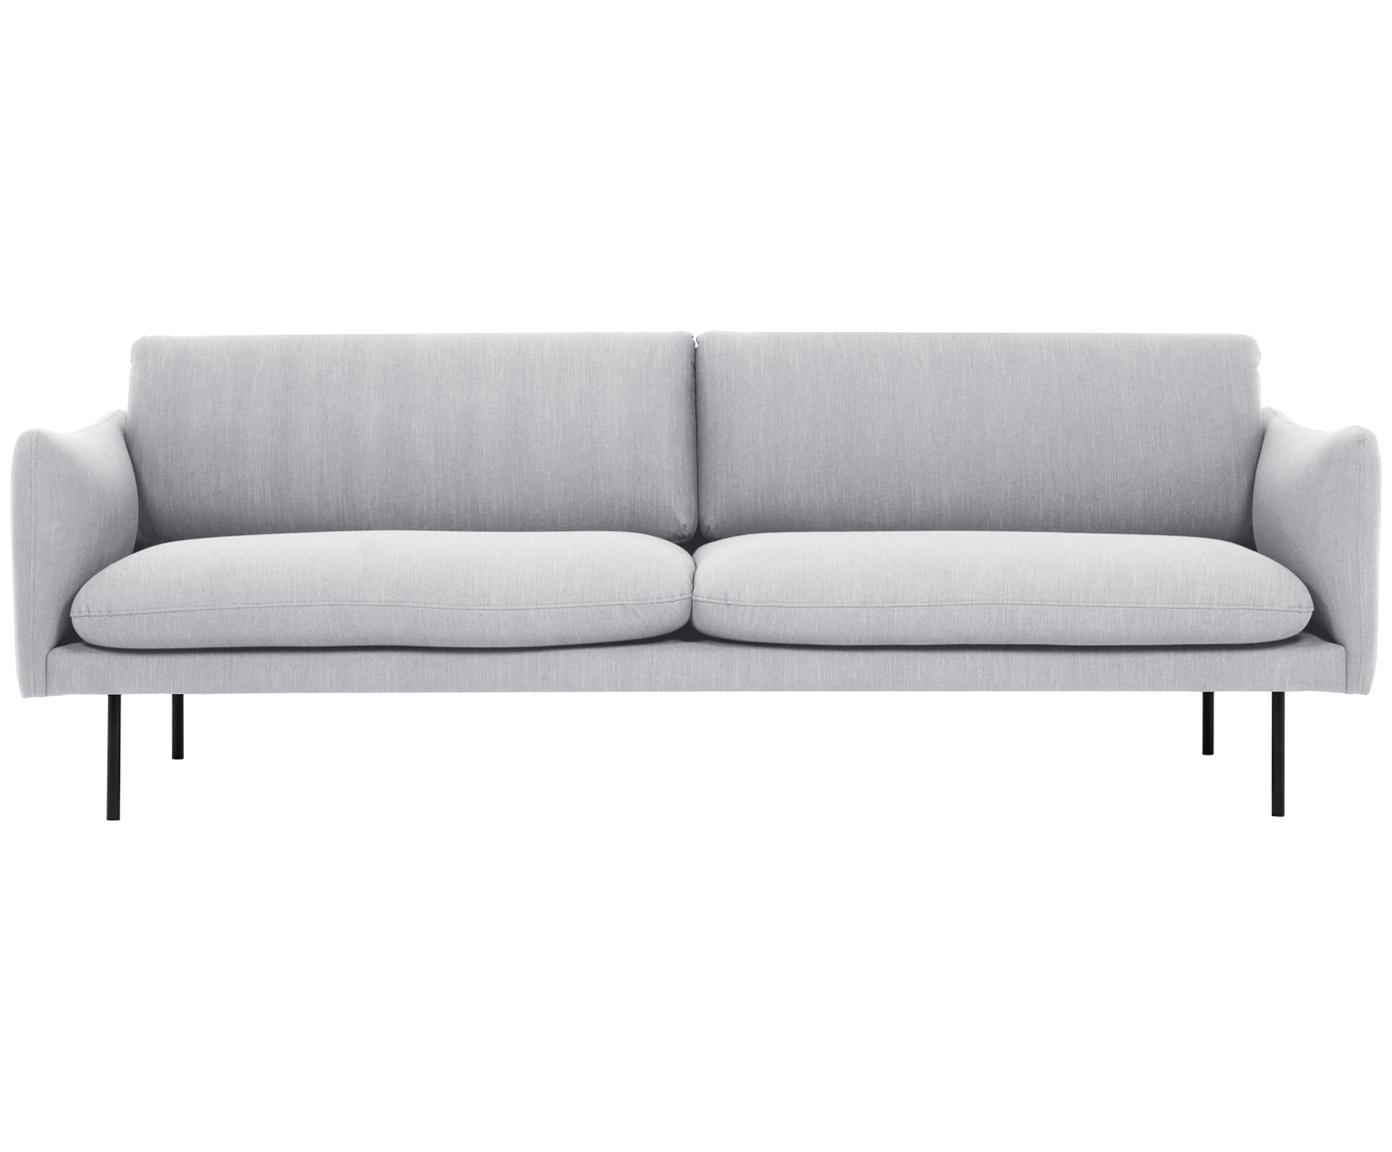 Sofa Moby (3-Sitzer), Bezug: Polyester 60.000 Scheuert, Gestell: Massives Kiefernholz, Webstoff Hellgrau, B 220 x T 95 cm